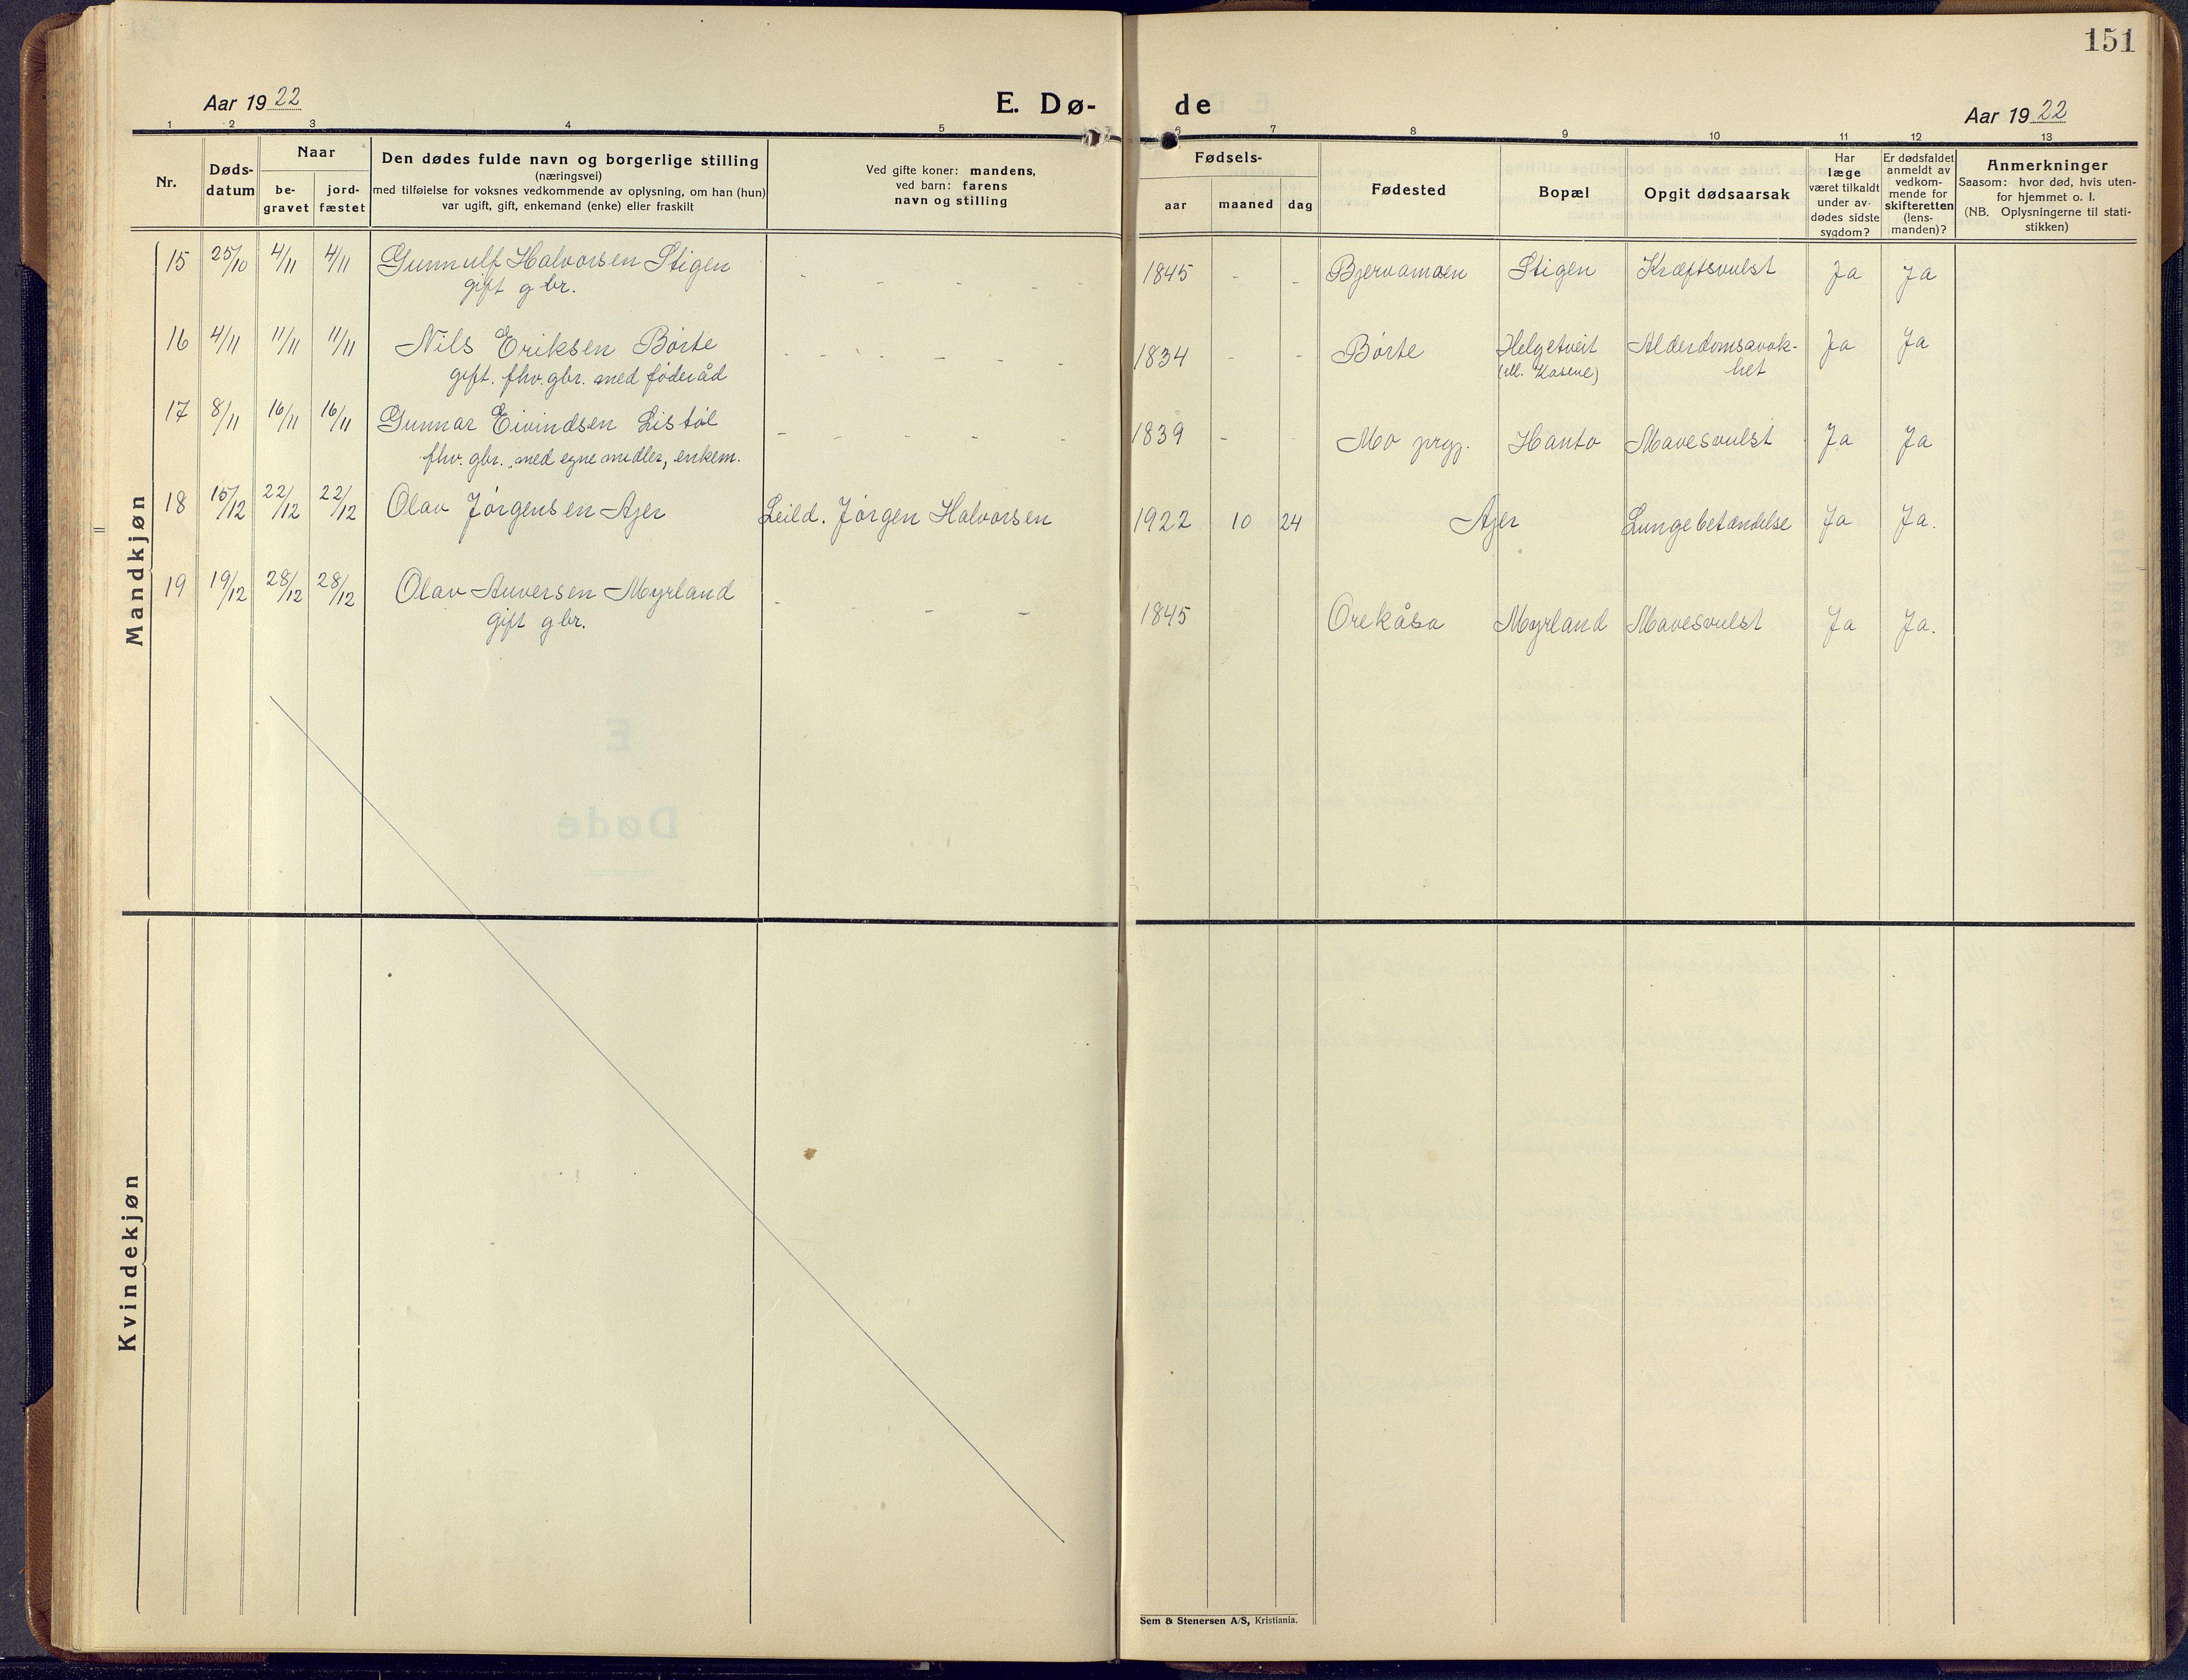 SAKO, Lunde kirkebøker, F/Fa/L0006: Ministerialbok nr. I 6, 1922-1940, s. 151